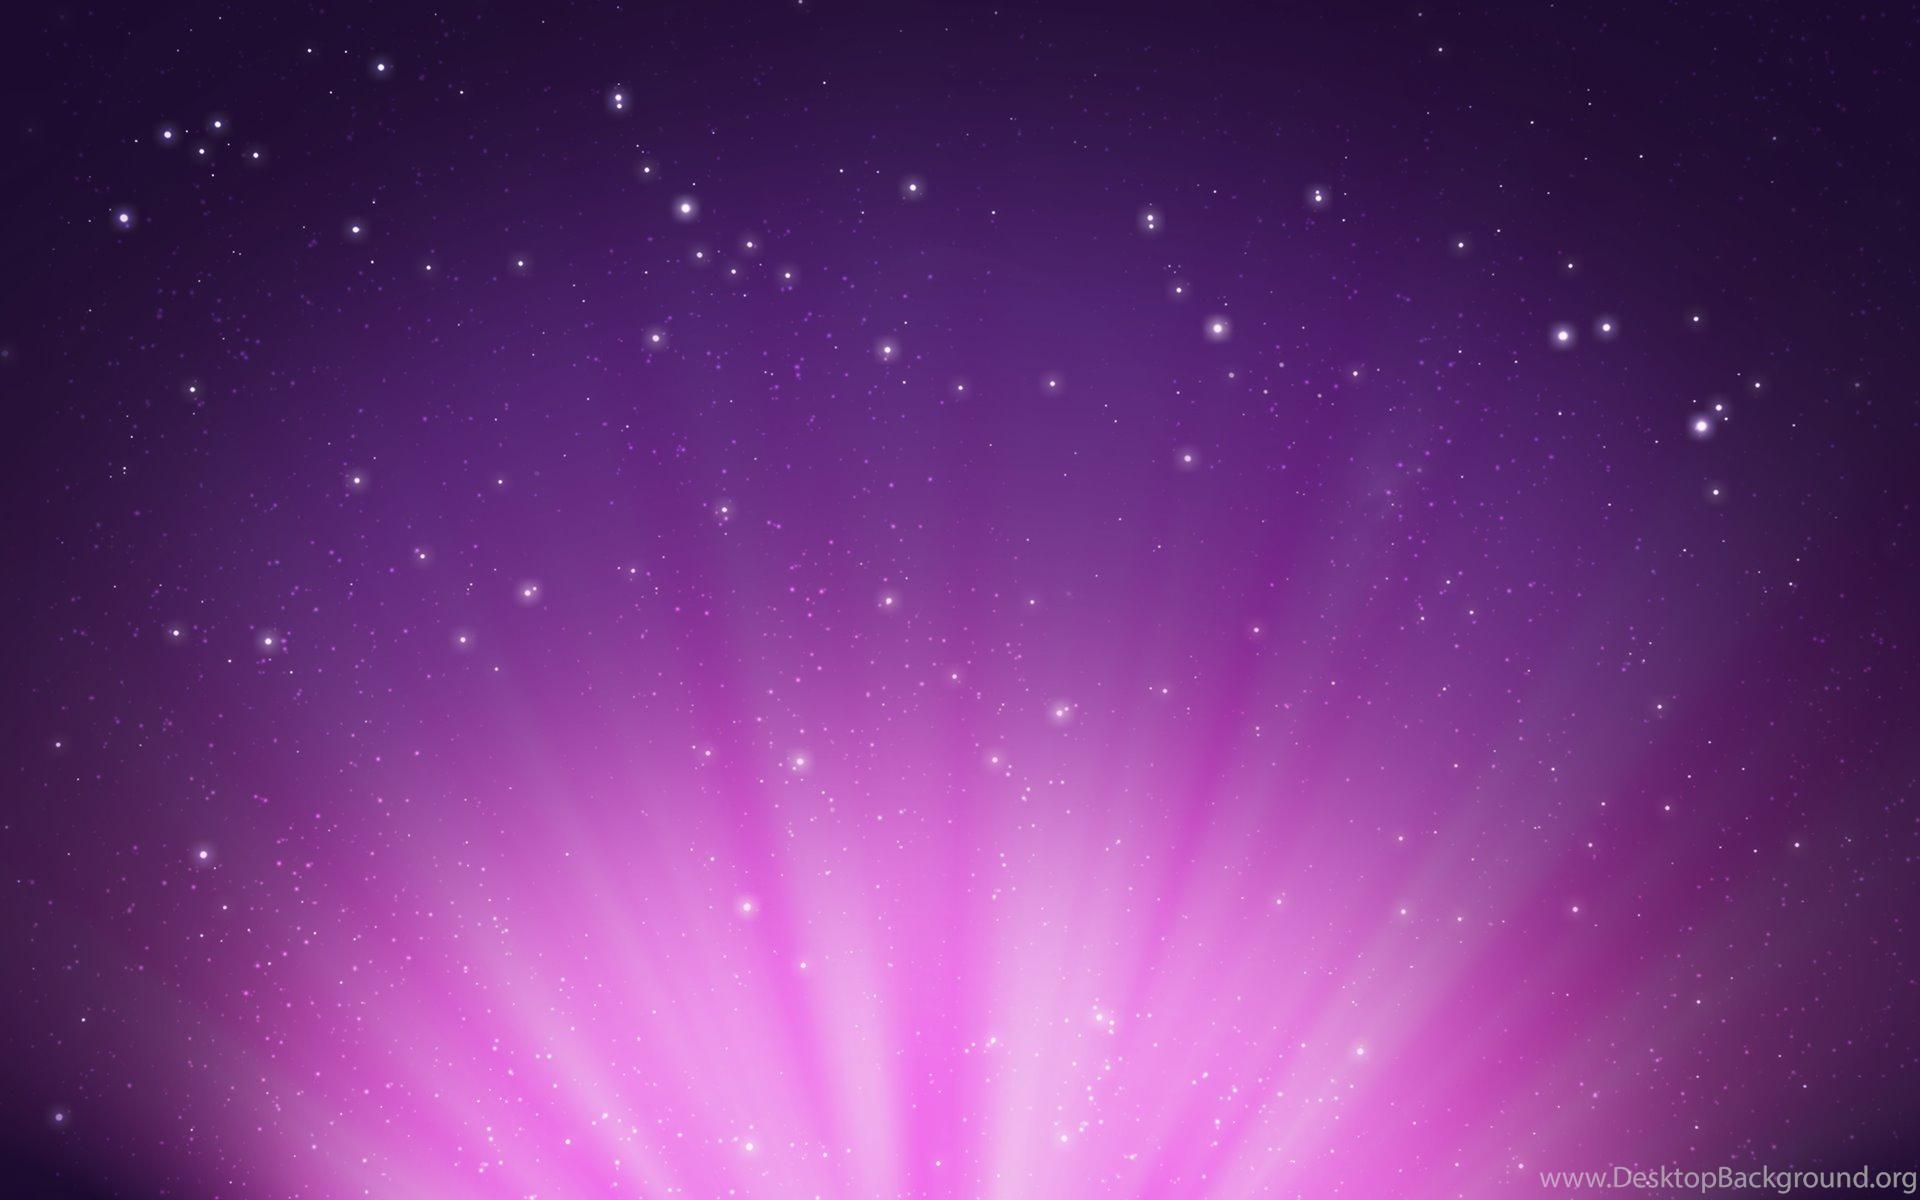 Full HD Wallpapers Backgrounds Purple Space Stars Desktop